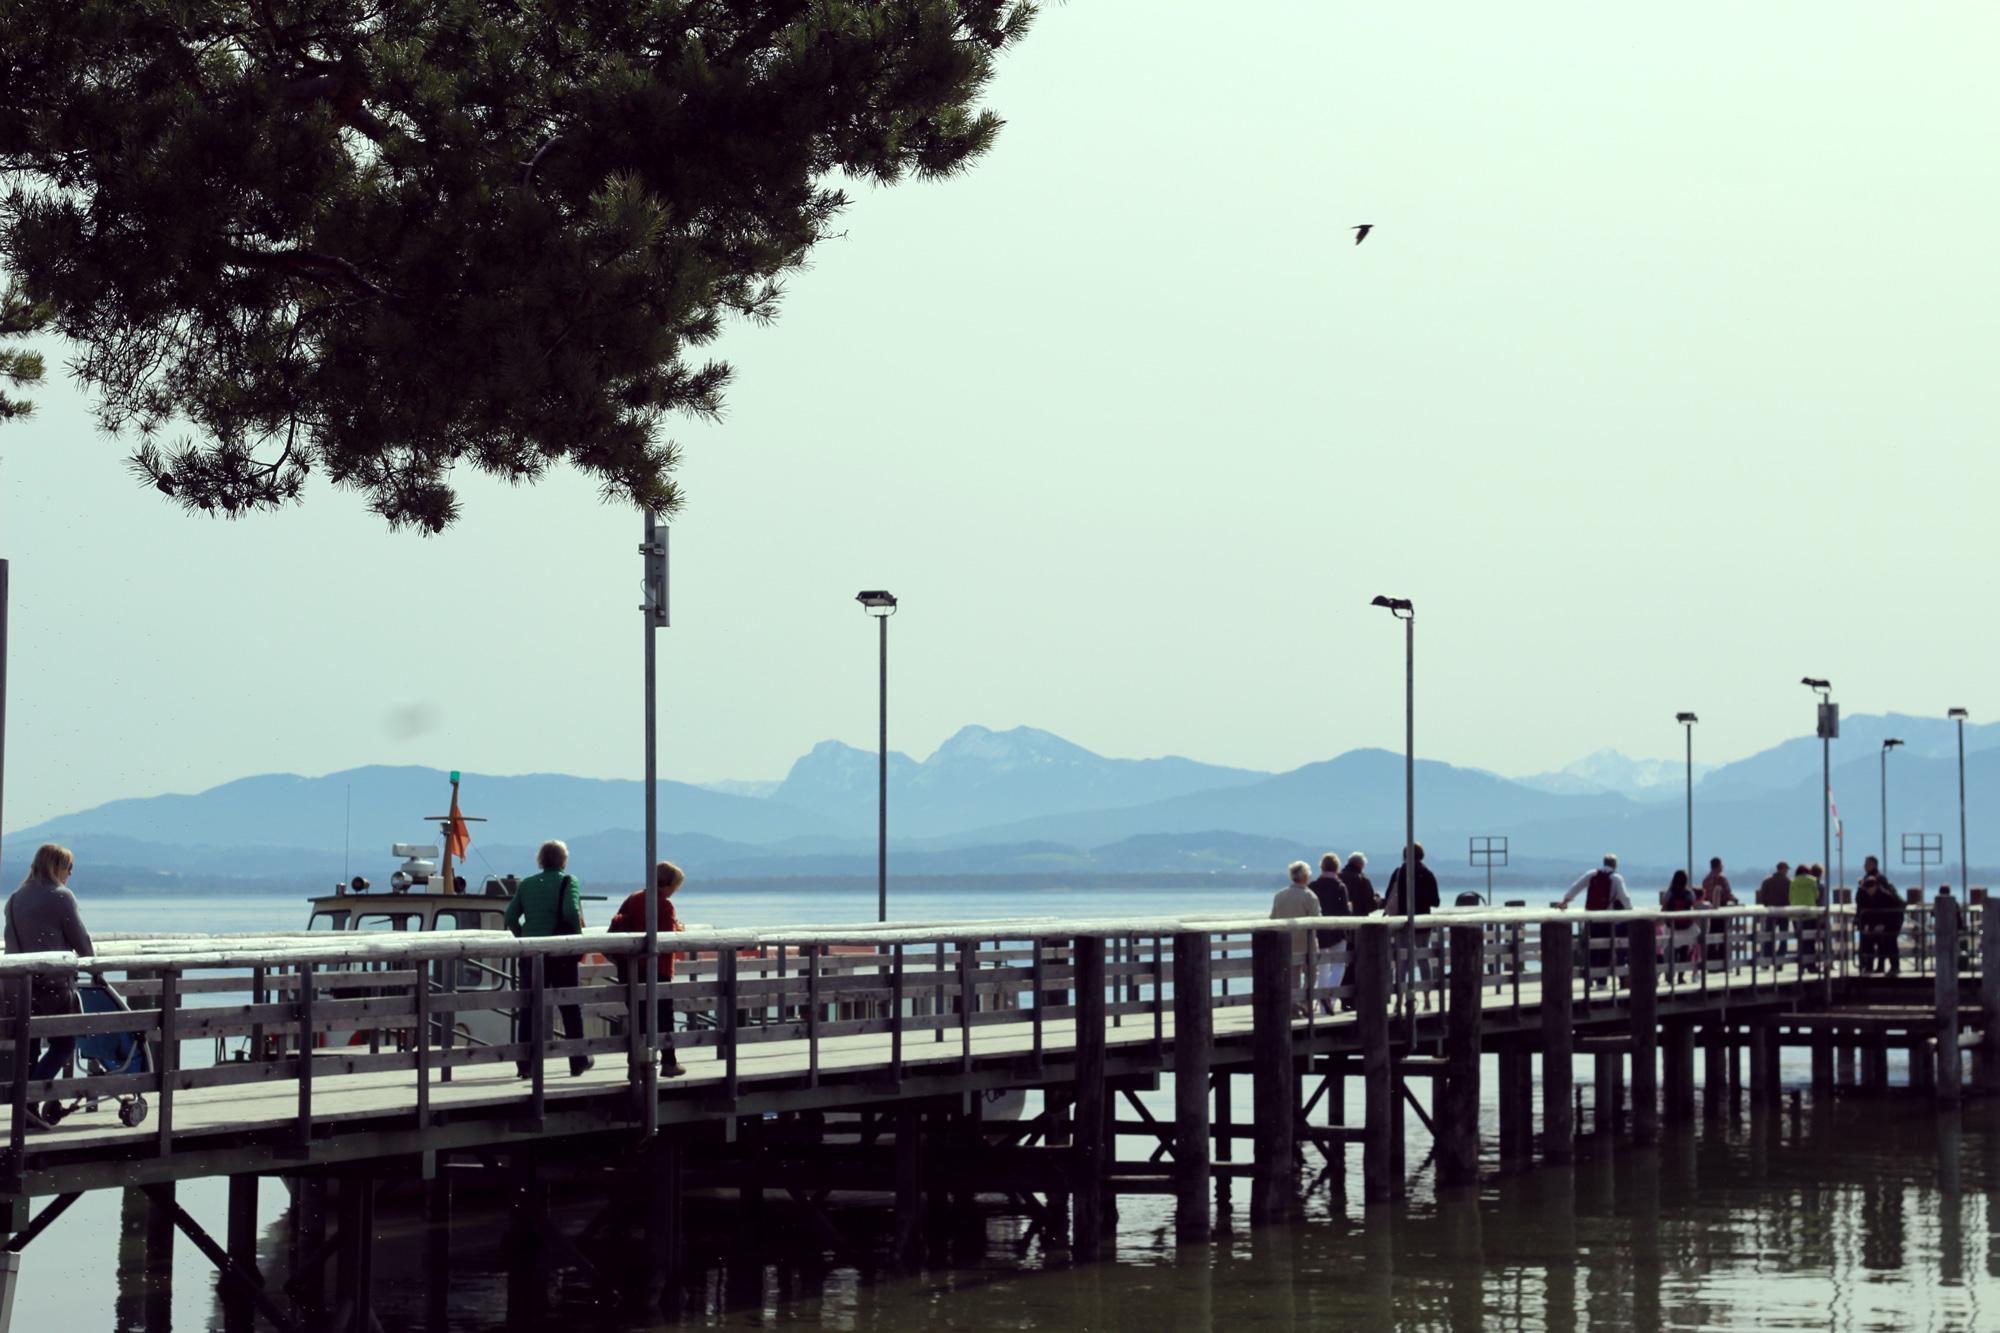 Cheimsee-lake-Bayern-weekend-escape-12